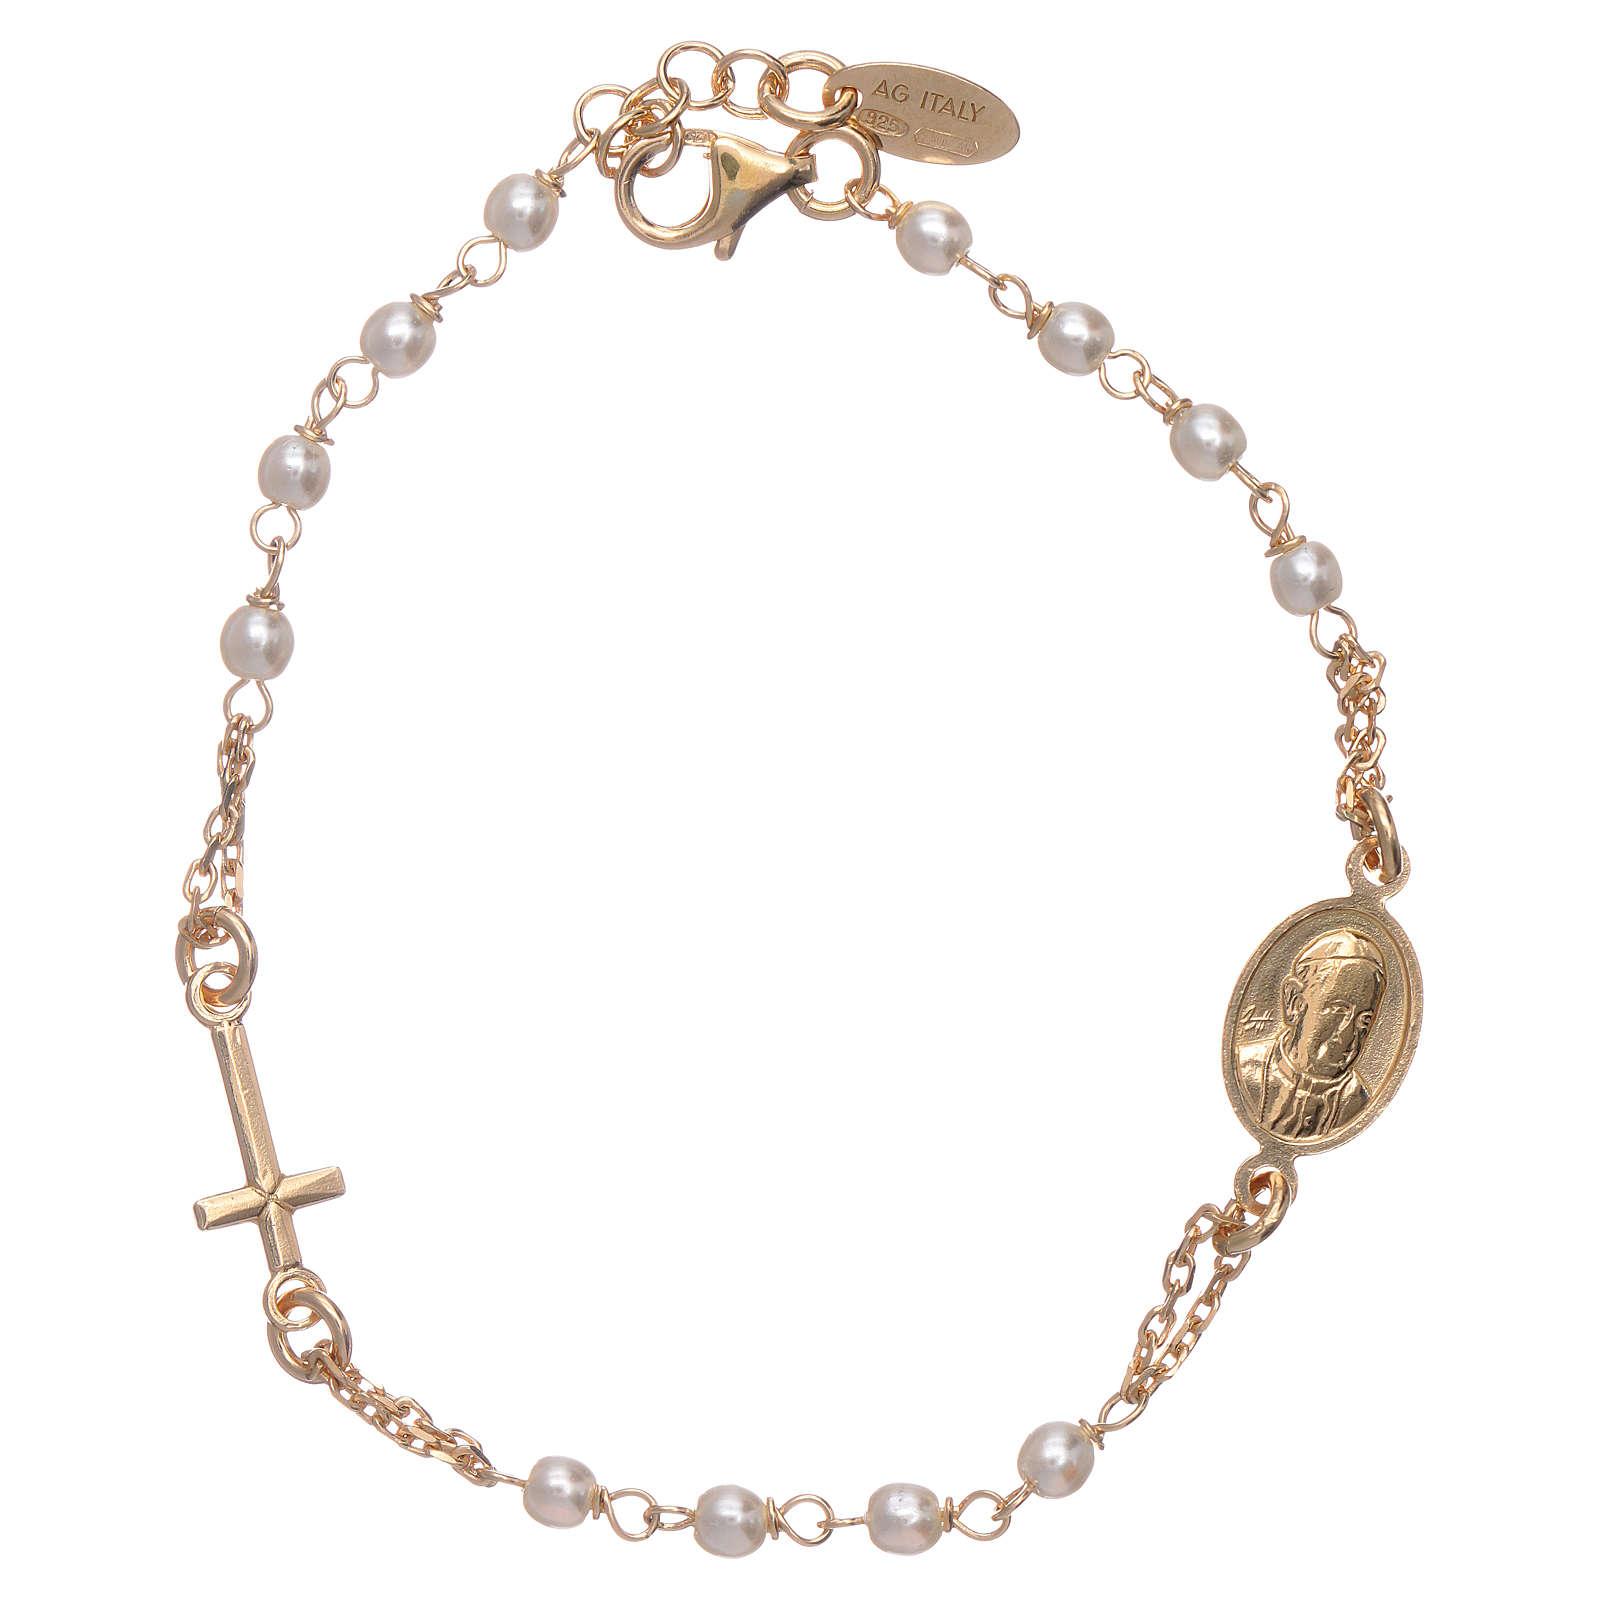 Bracciale AMEN rosario Giubileo argento 925 oro e perle Swarovski 4